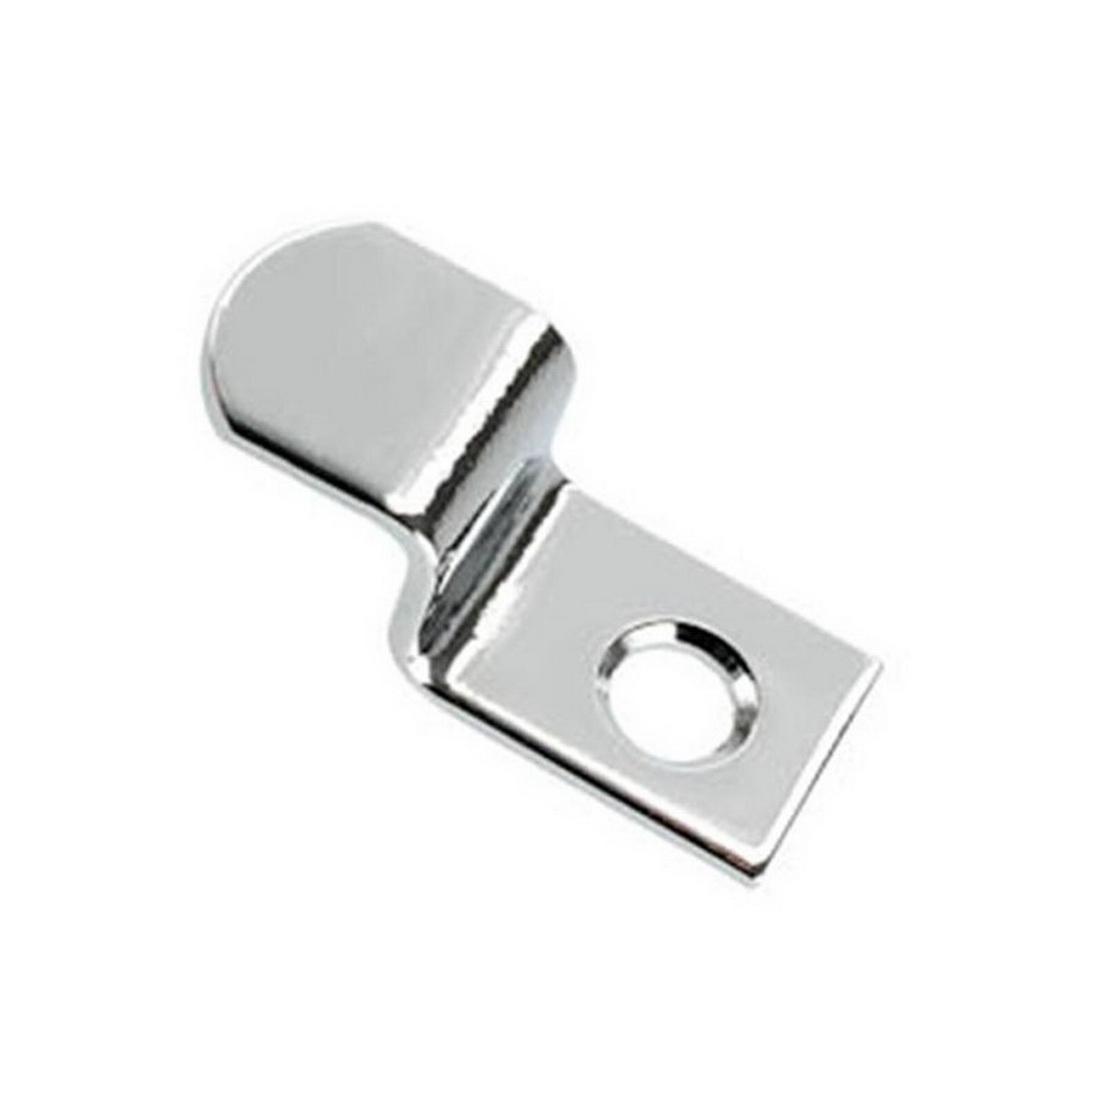 Minipak Mirror Clip 20 Pack